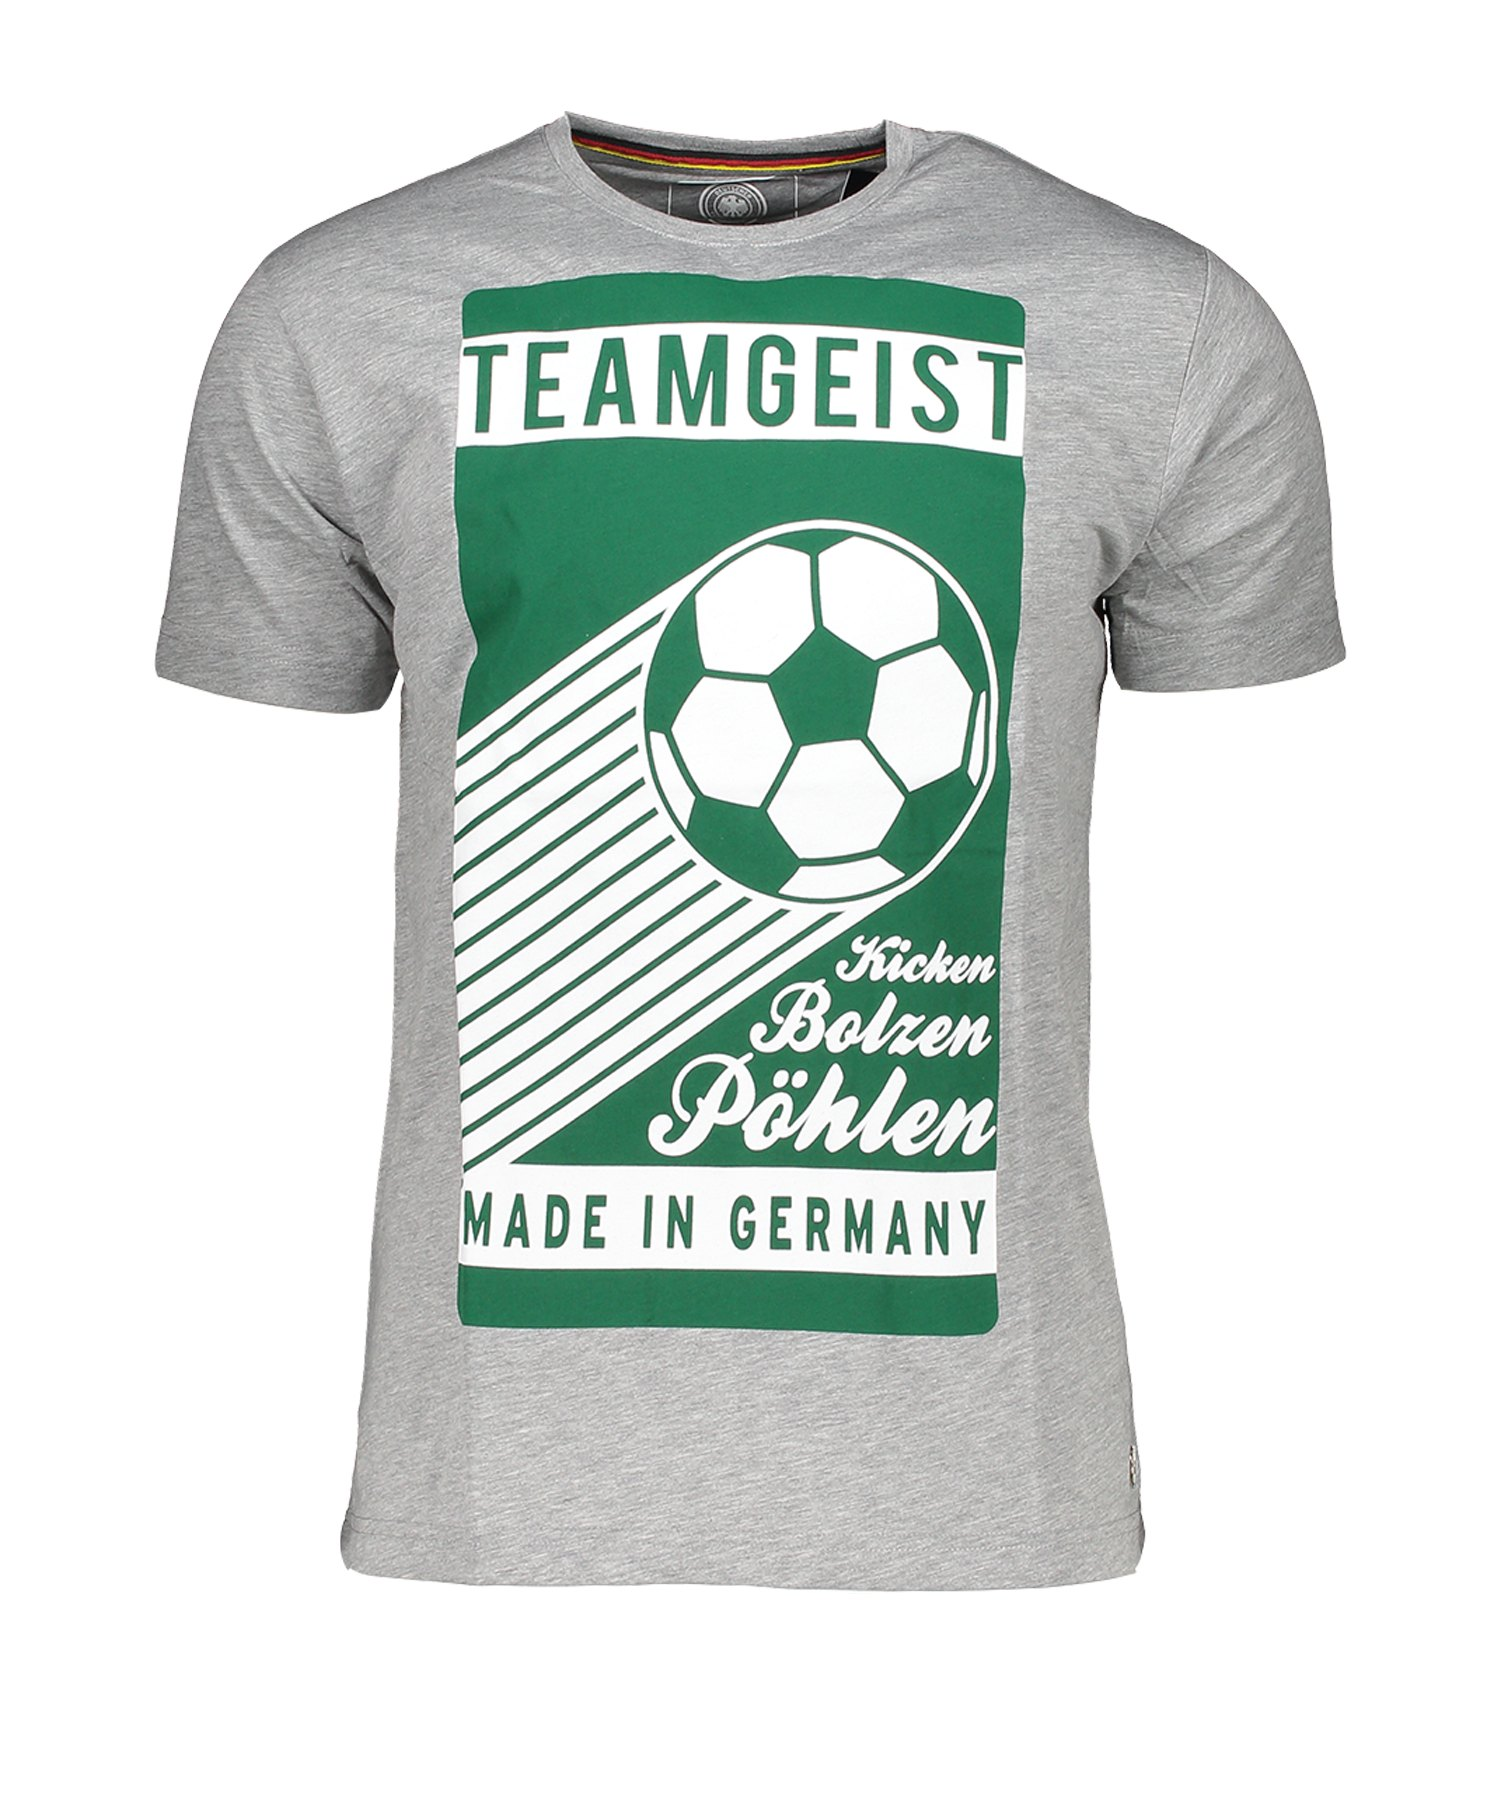 DFB Deutschland Teamgeist T-Shirt Grau - Grau